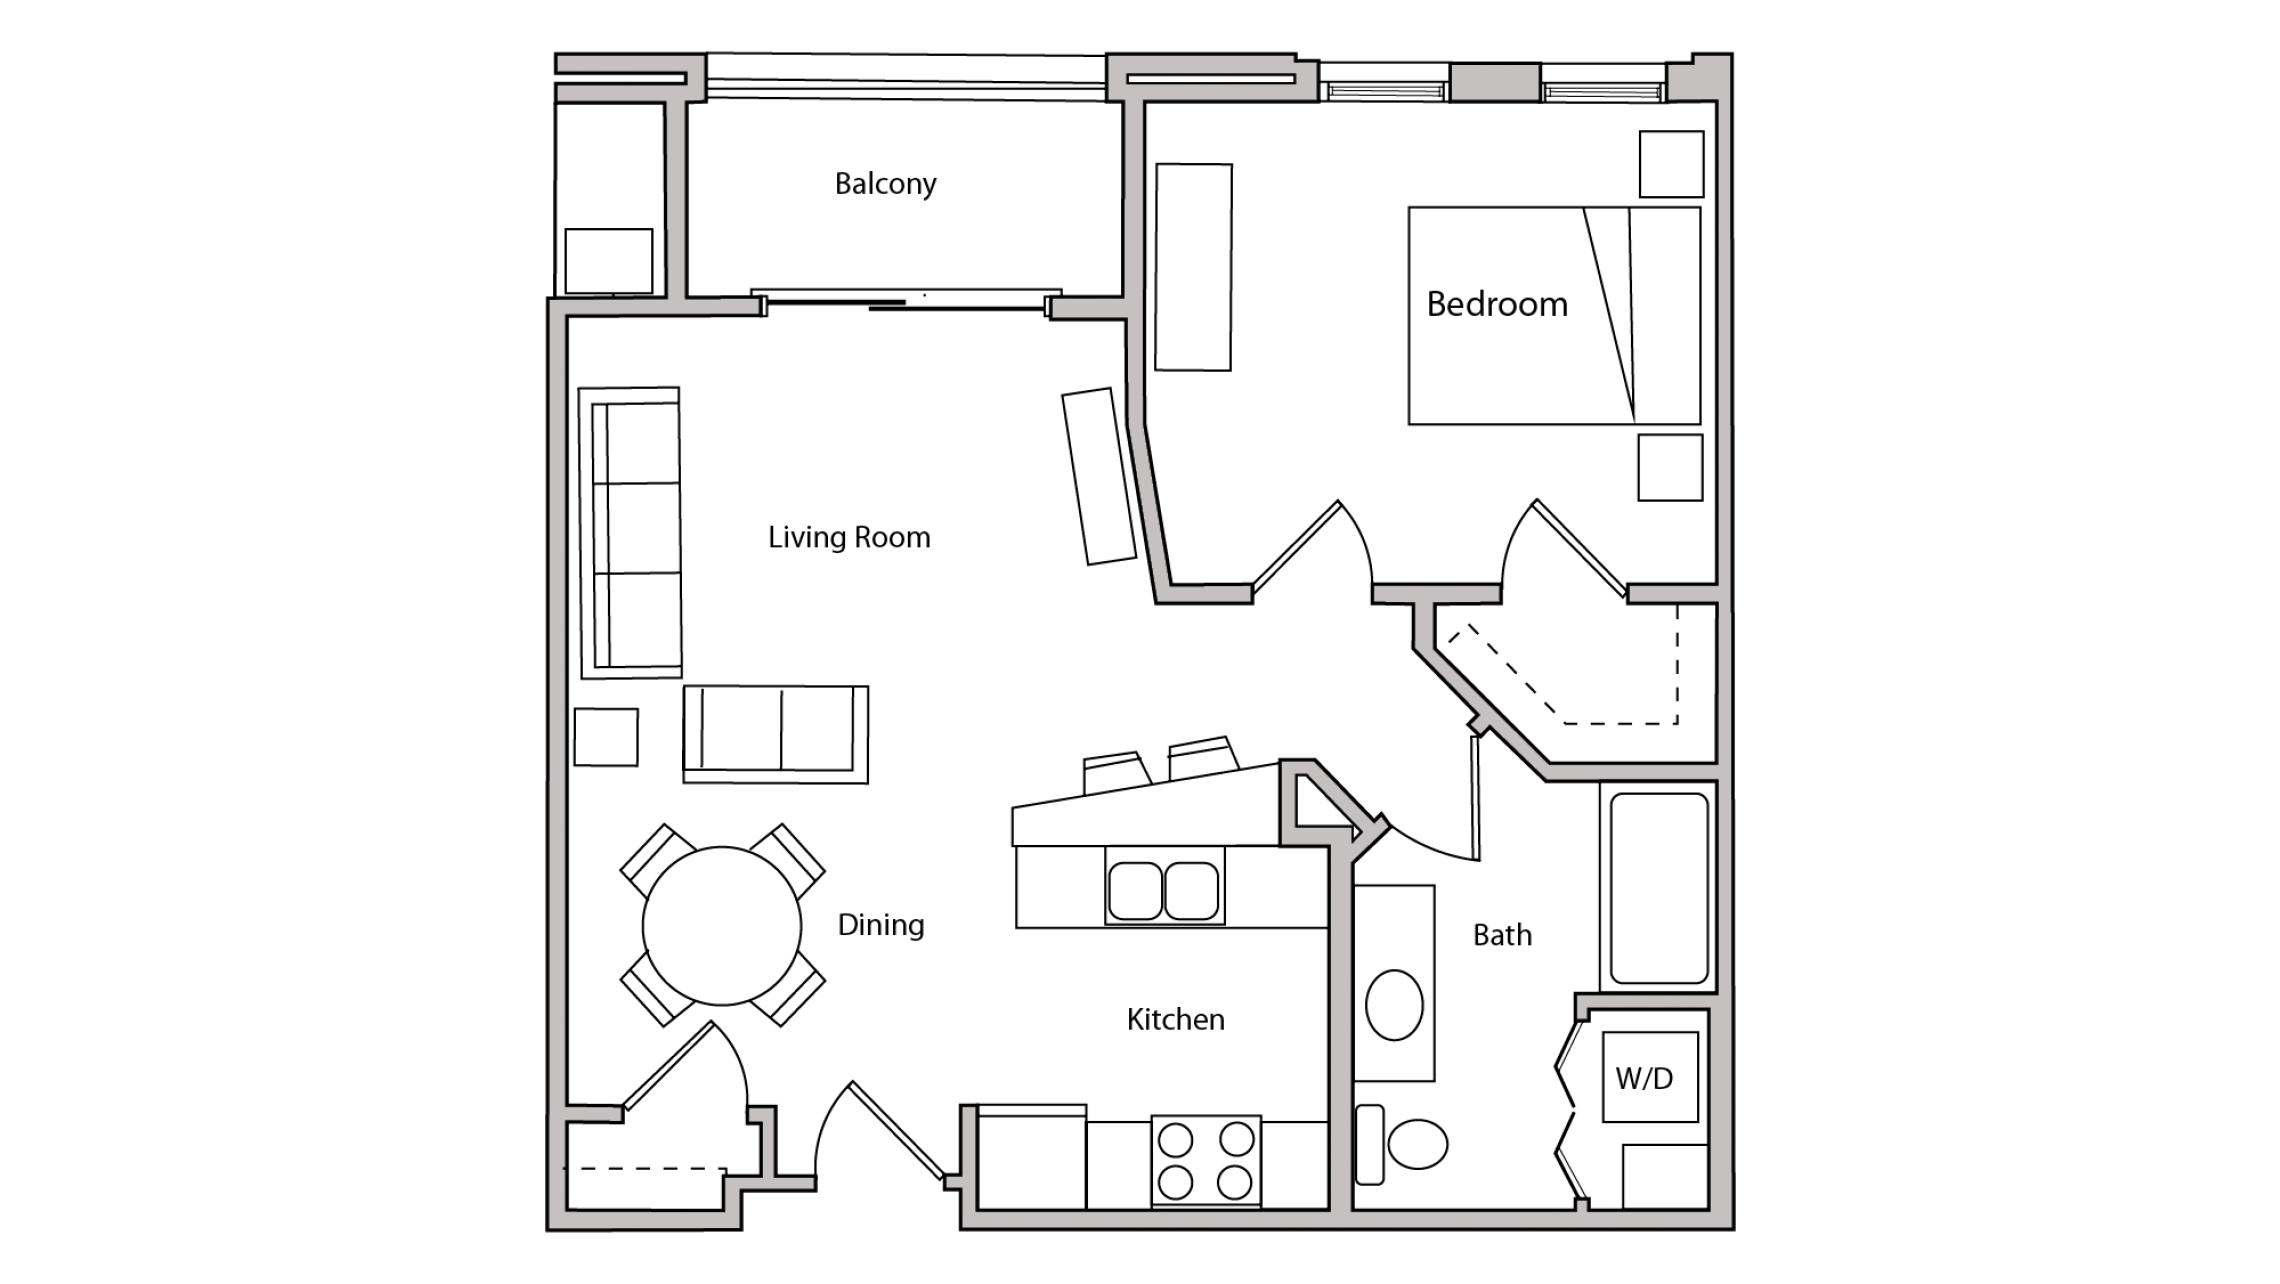 ULI The Depot 2-407 - One Bedroom, One Bathroom